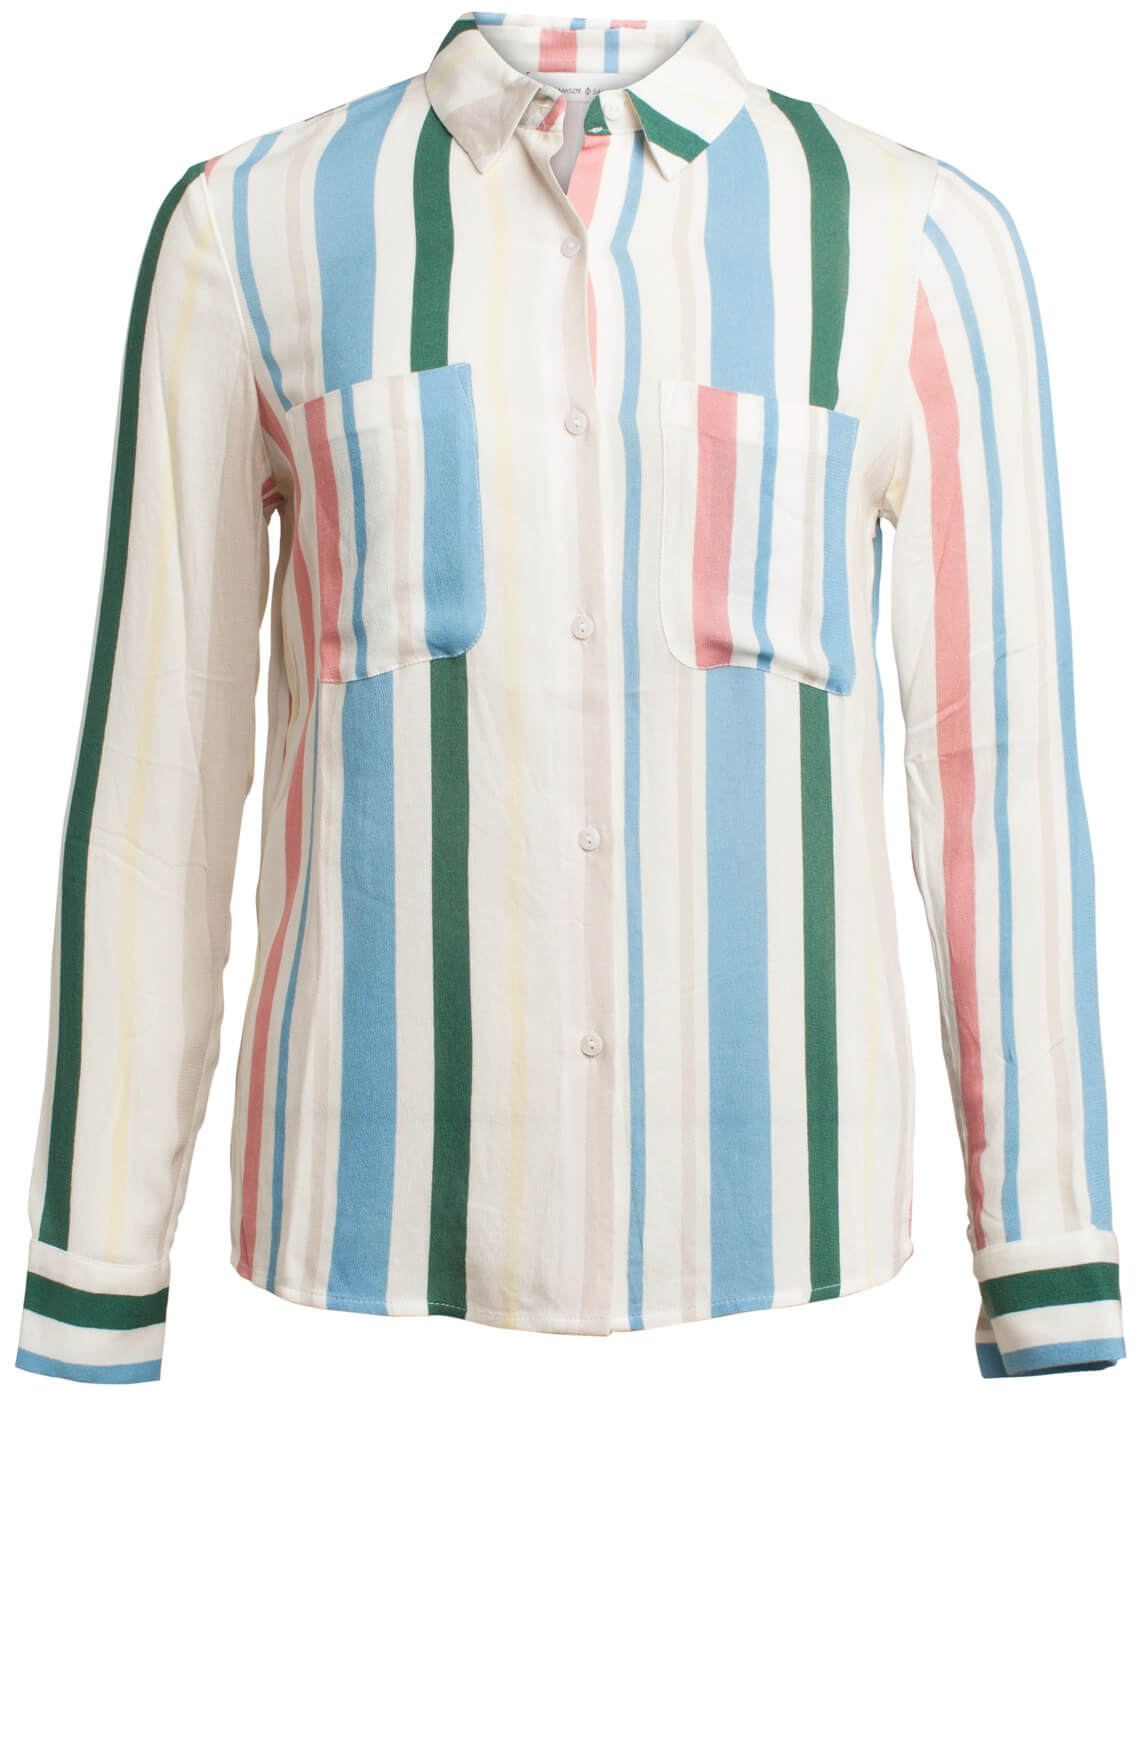 Samsoe Samsoe Dames Milly blouse met strepen Blauw